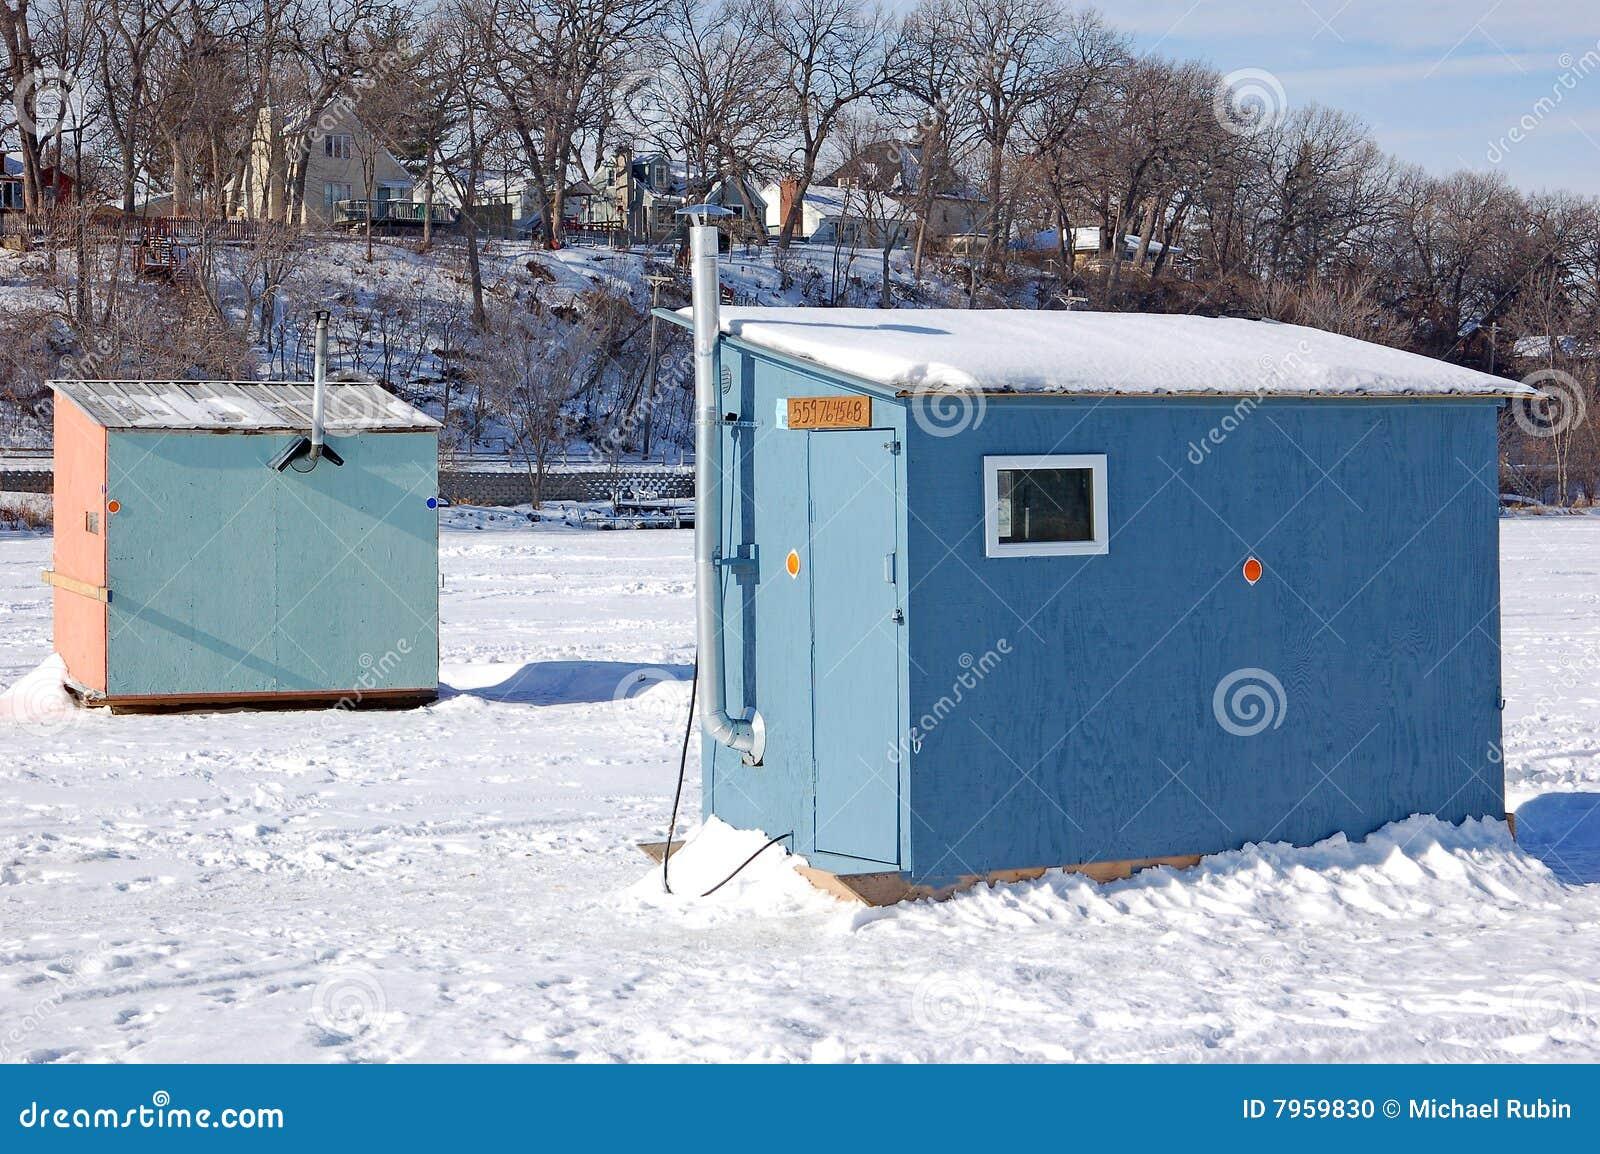 Ice fishing houses - photo#25